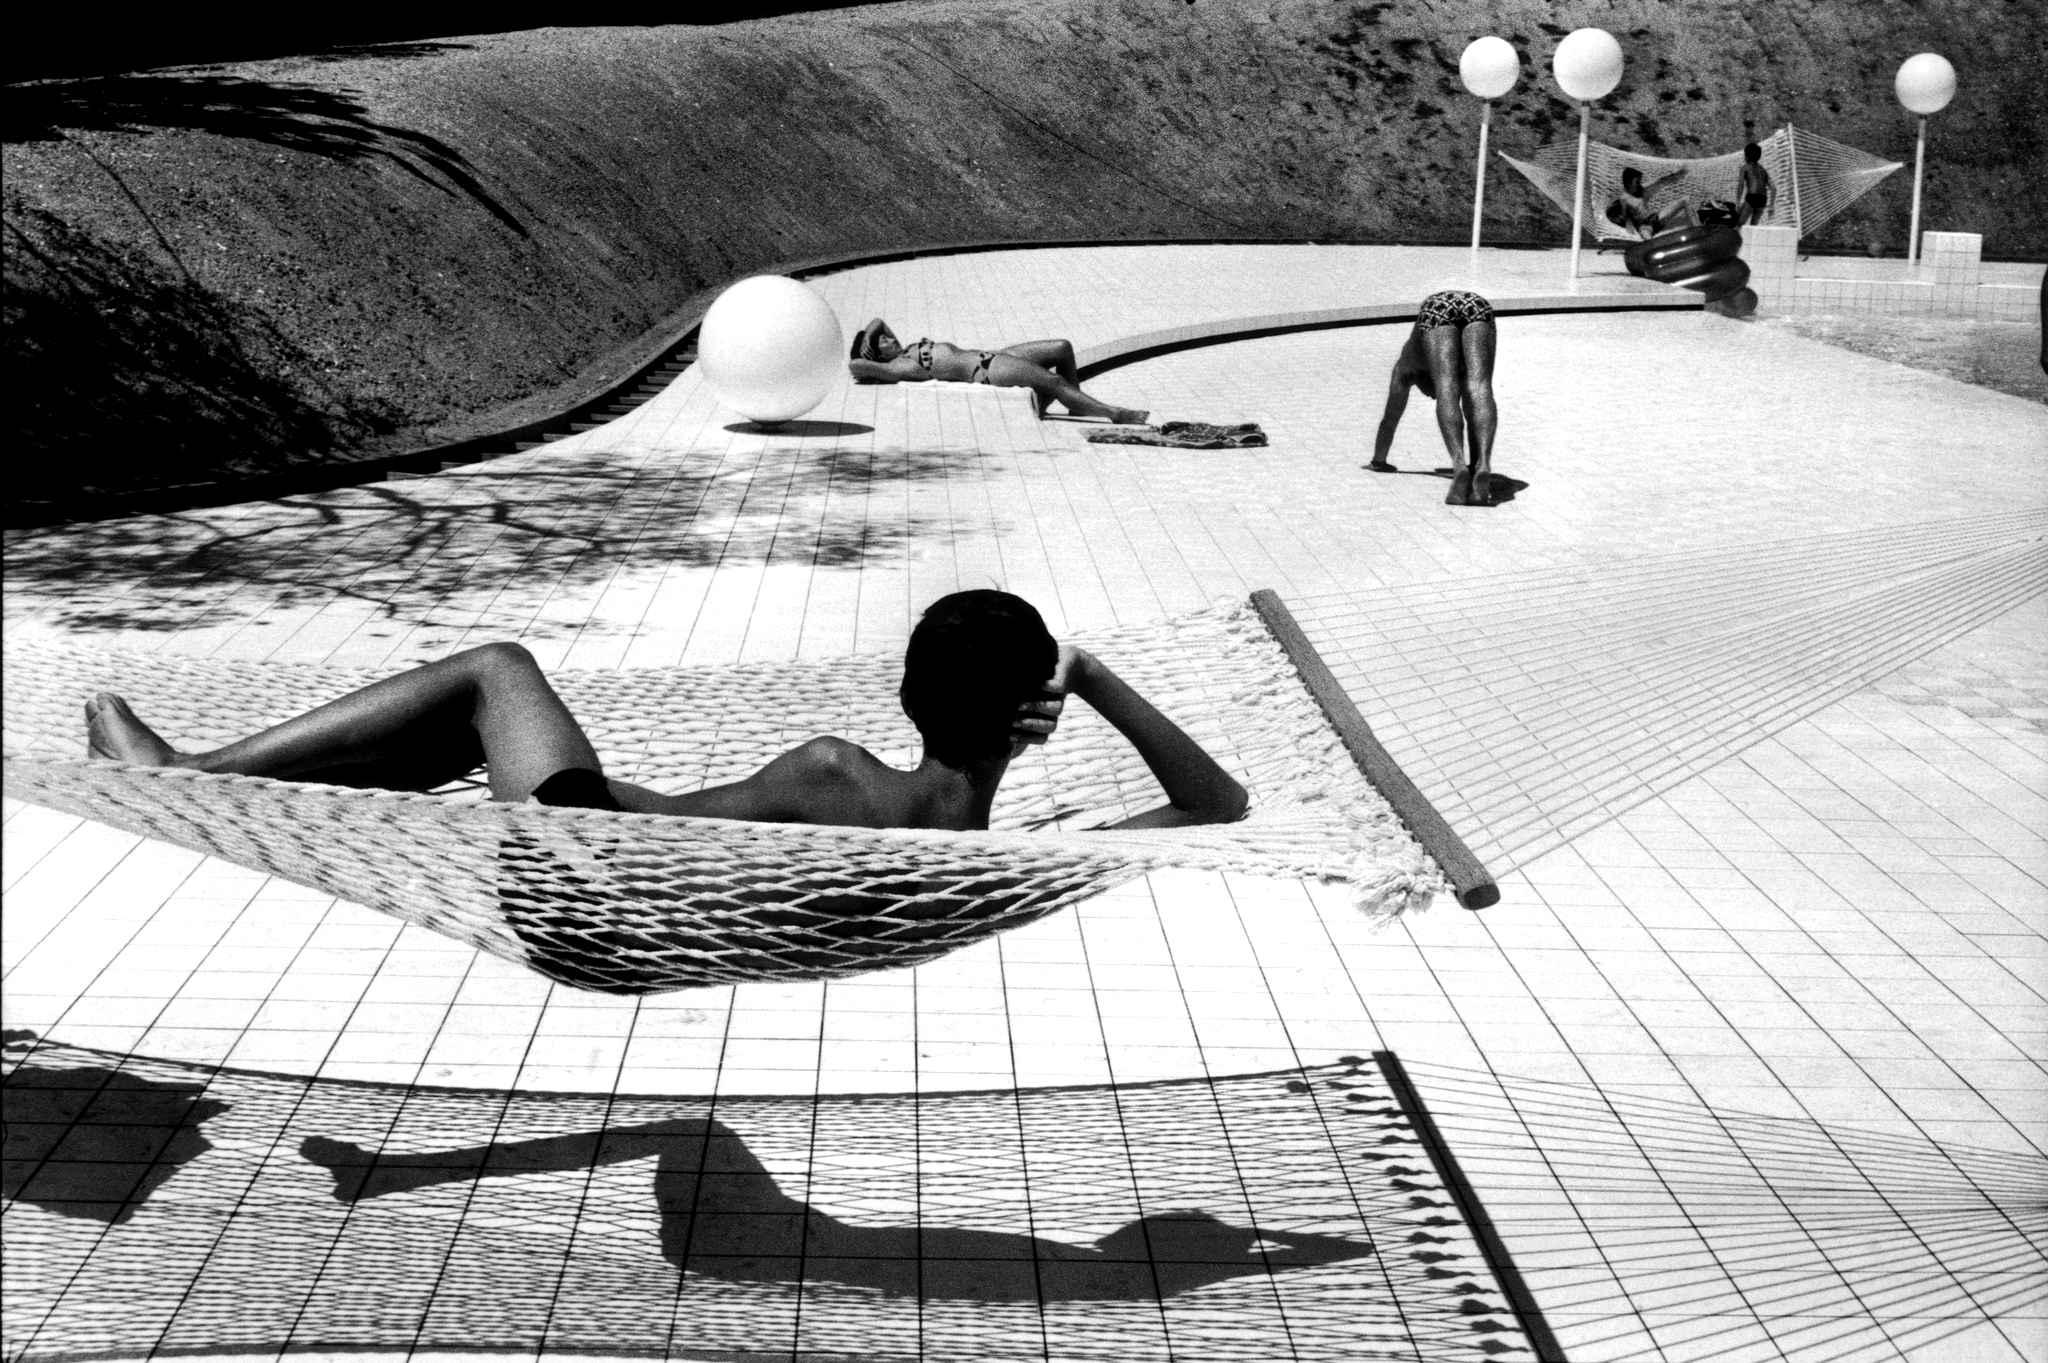 foto: Martine franck – Piscine, 1976